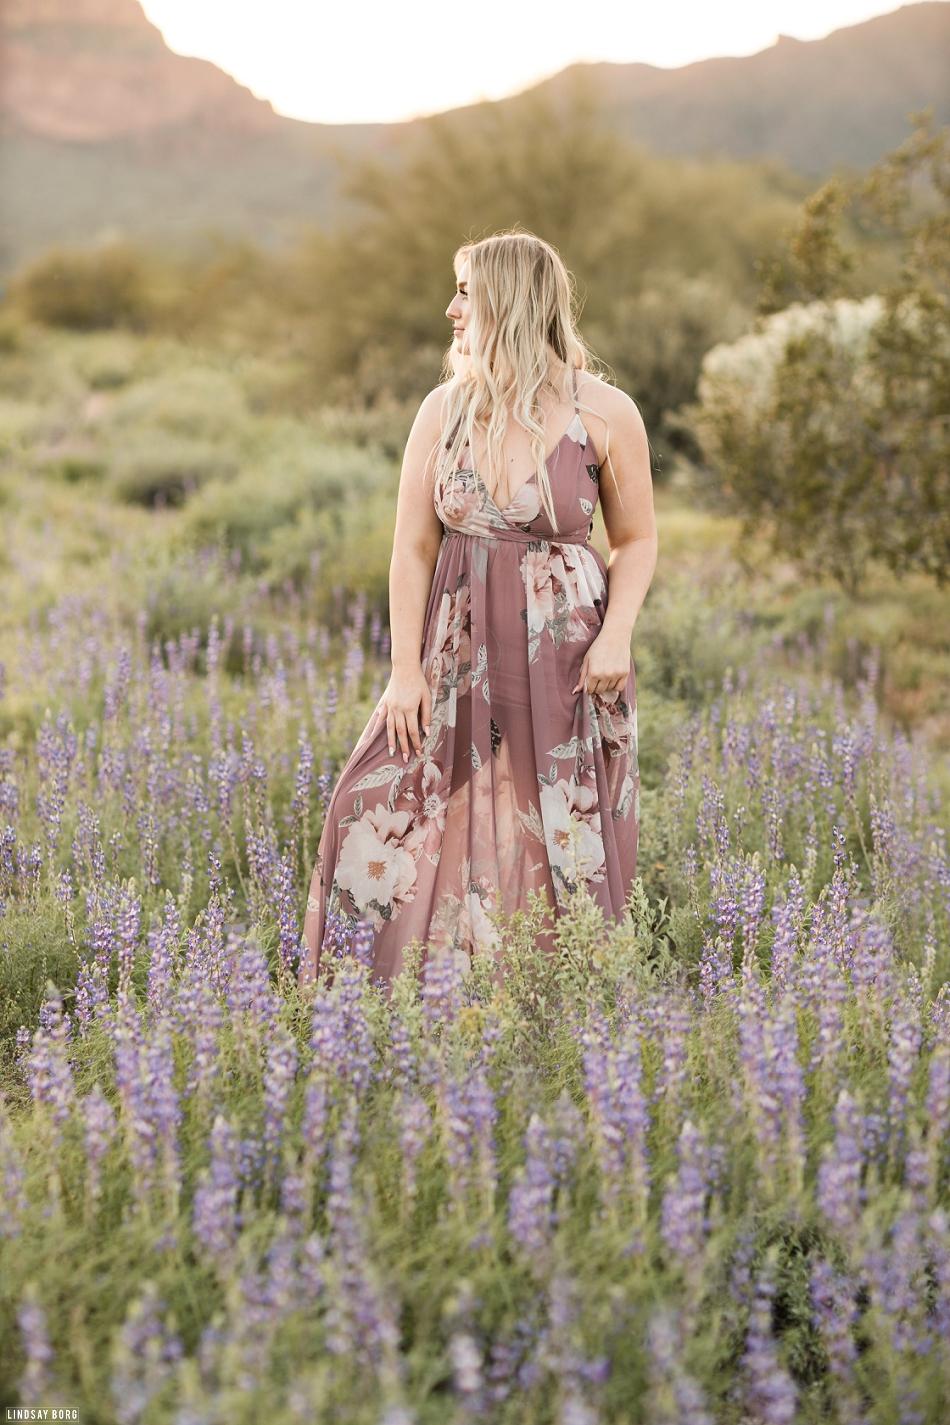 Lindsay-Borg-Photography-Arizona_2816.jpg